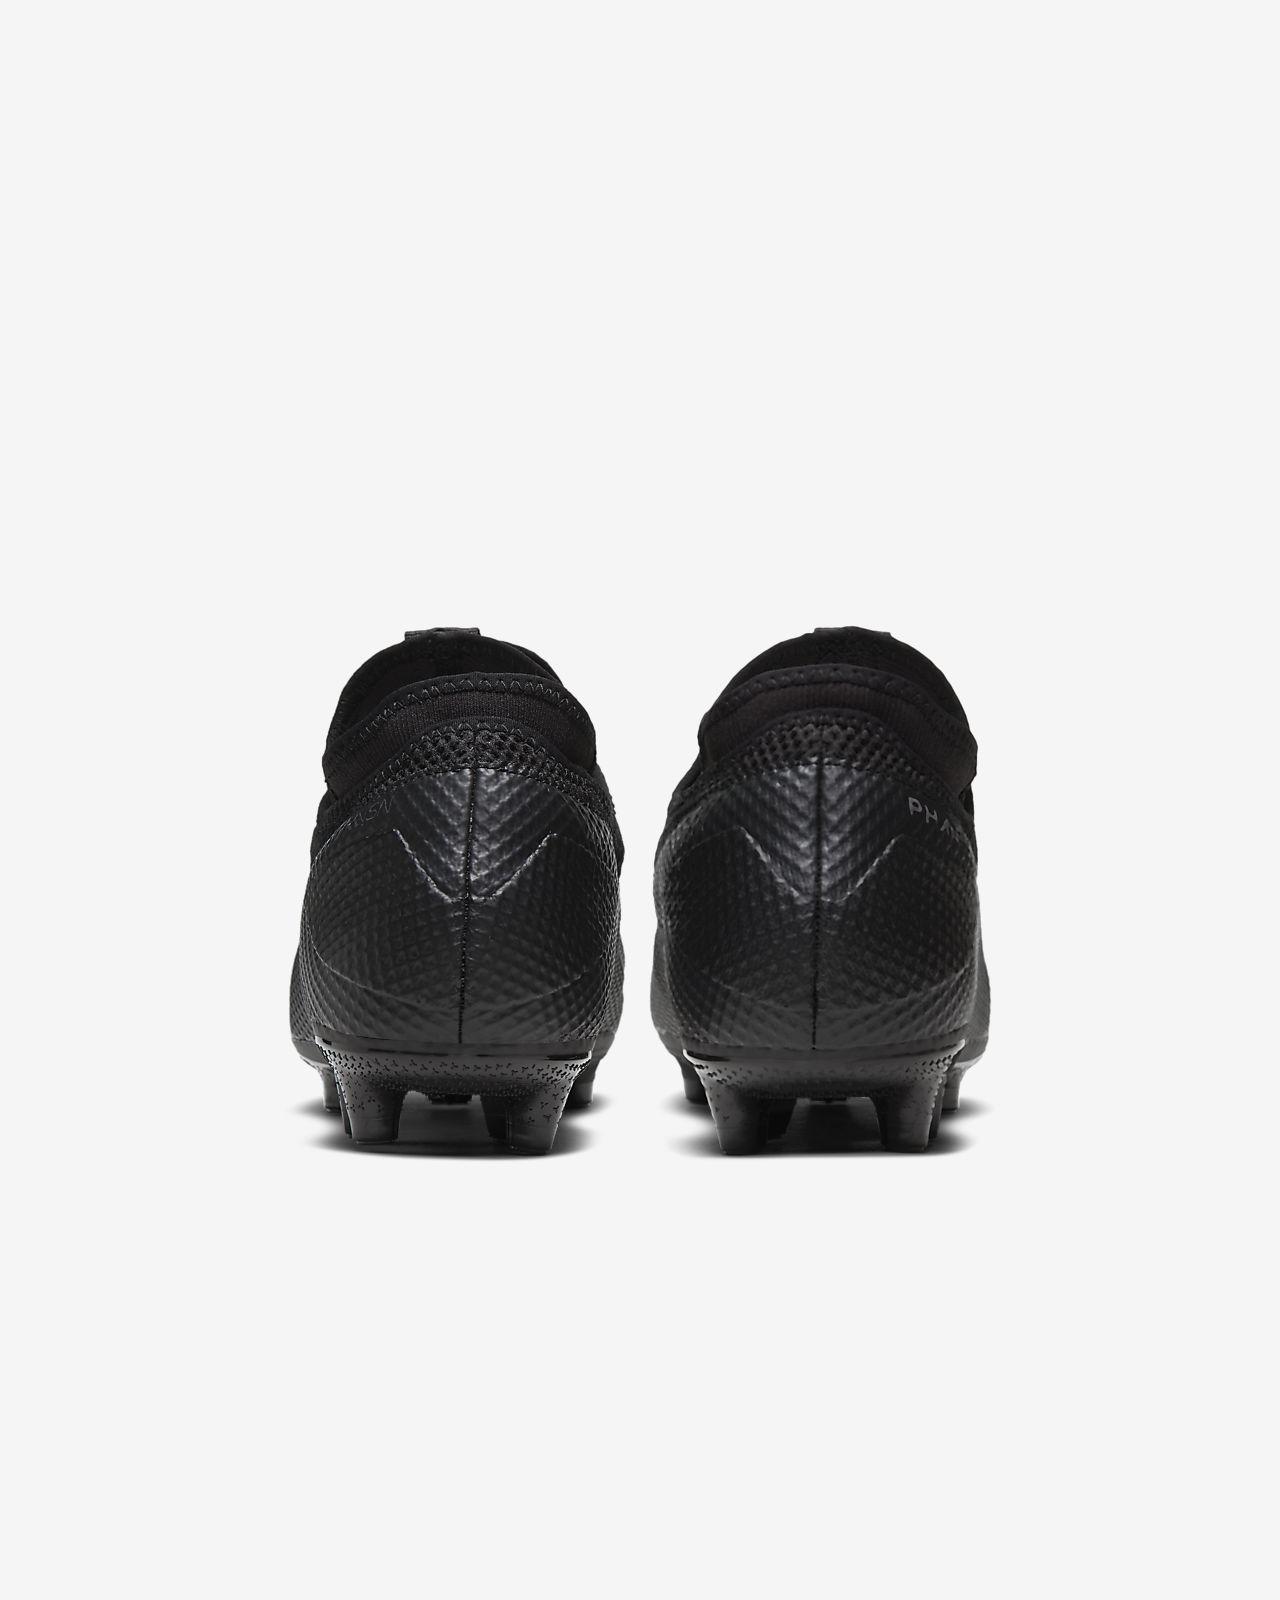 Nike Phantom Vision 2 Academy Dynamic Fit MG Multi Ground Football Boot Black